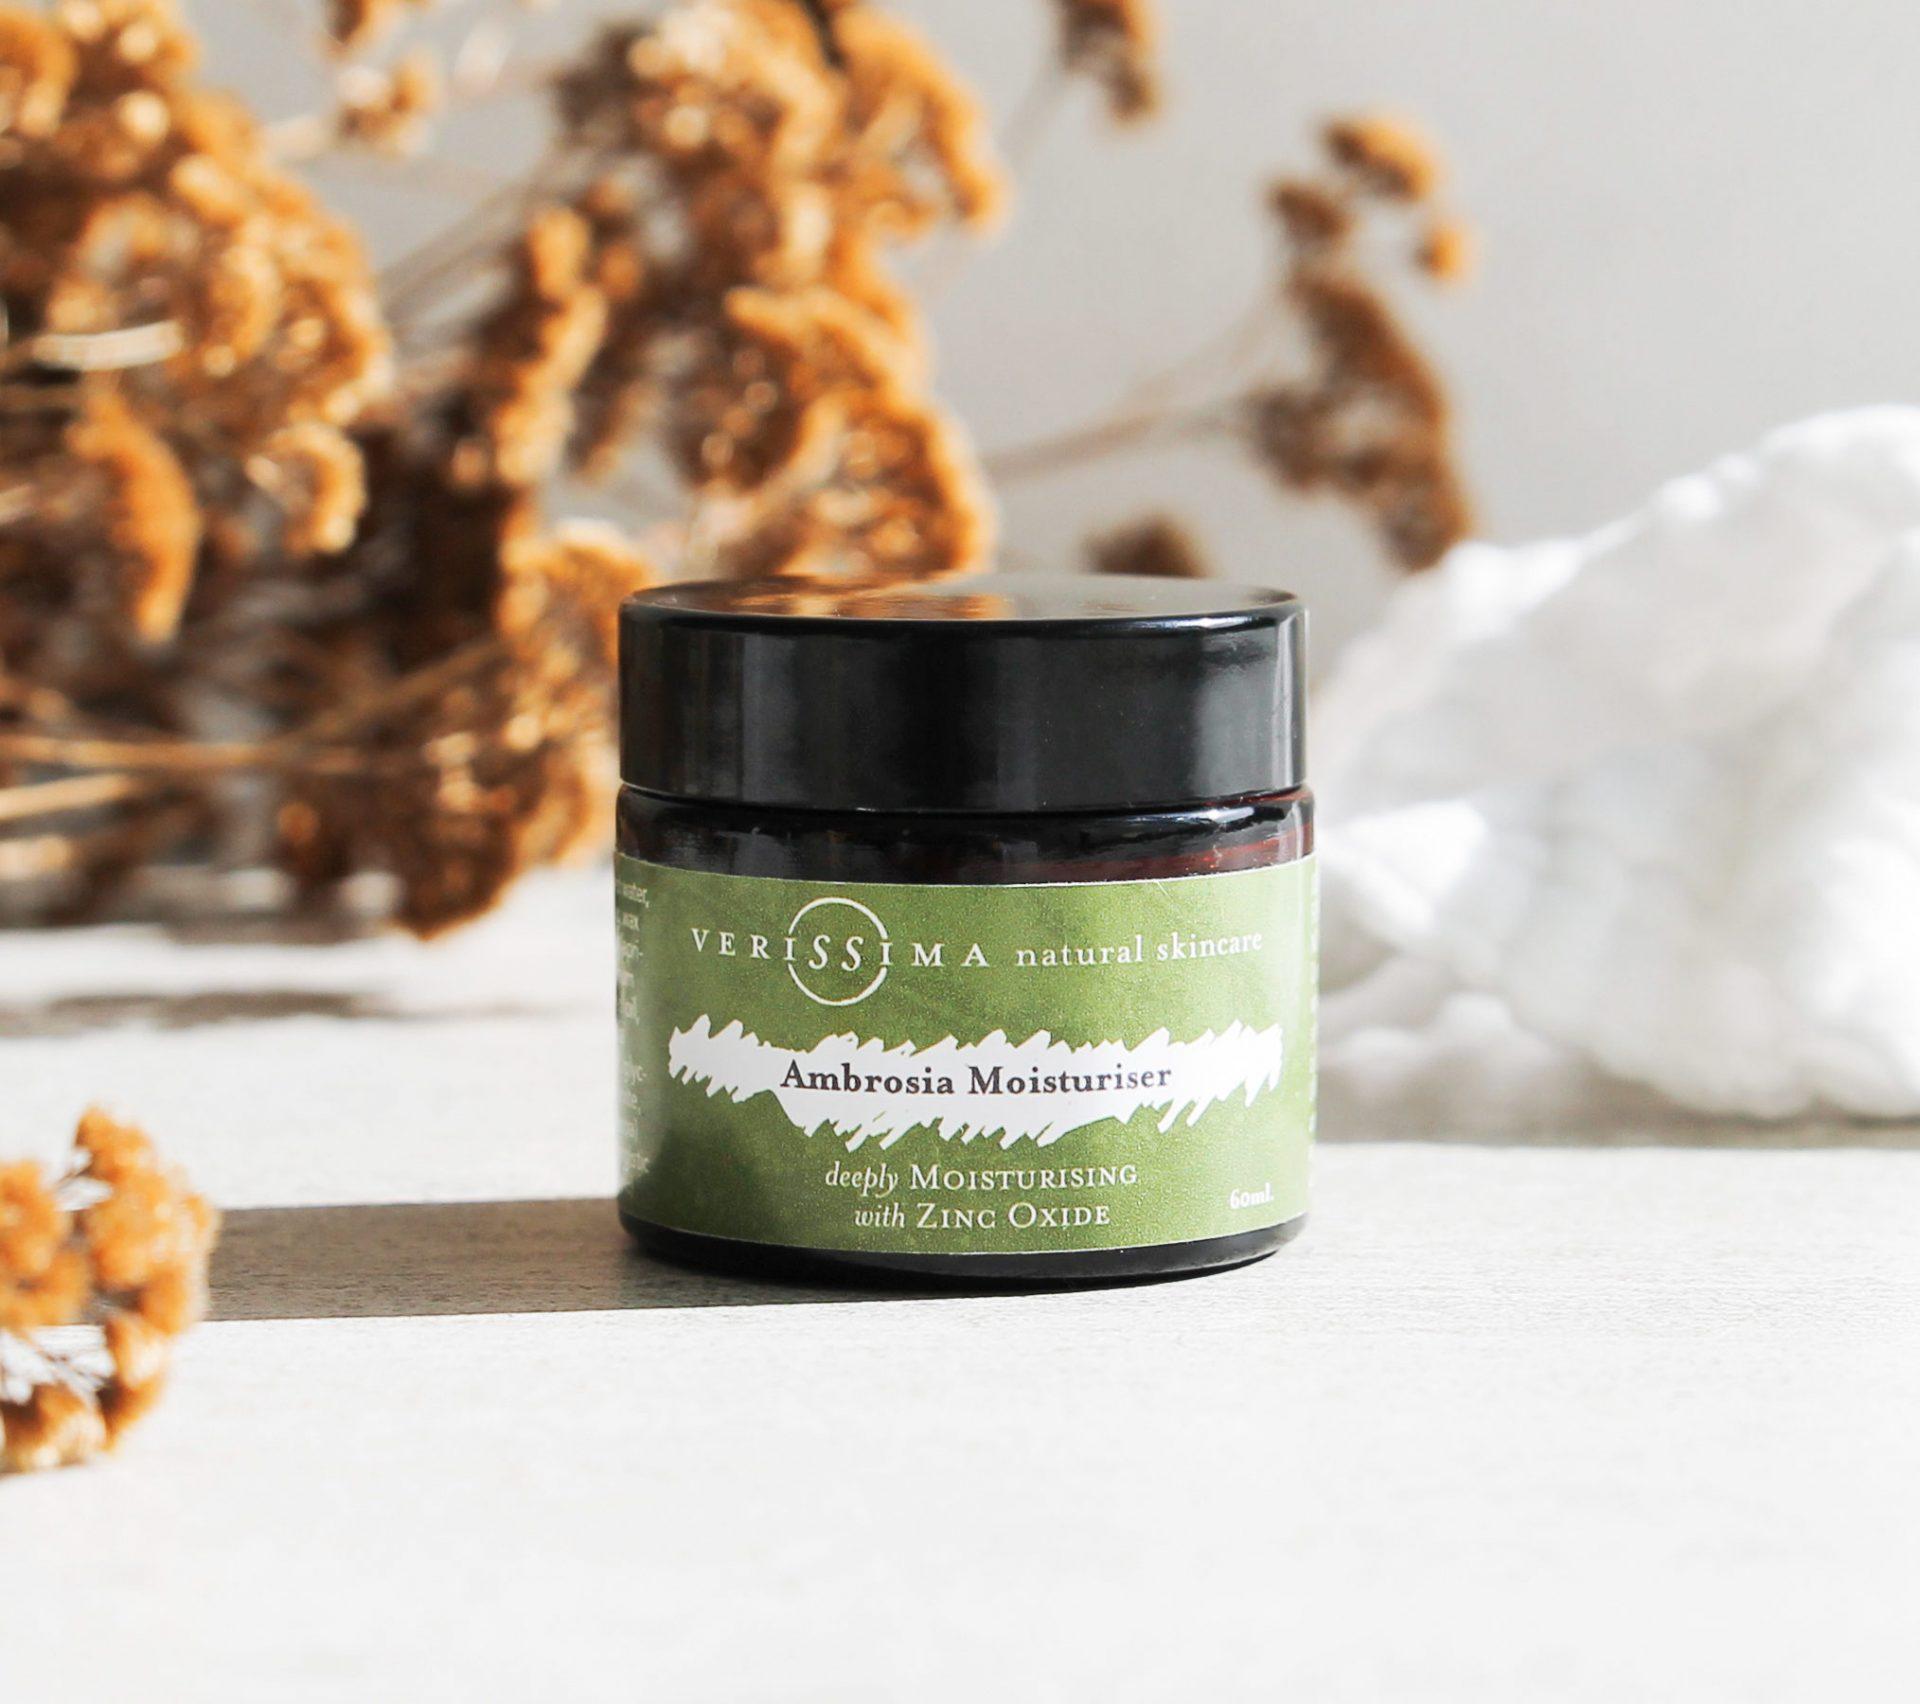 Natural Sunscreen| Ambrosia Moisturiser | Verissima Natural Skin Care